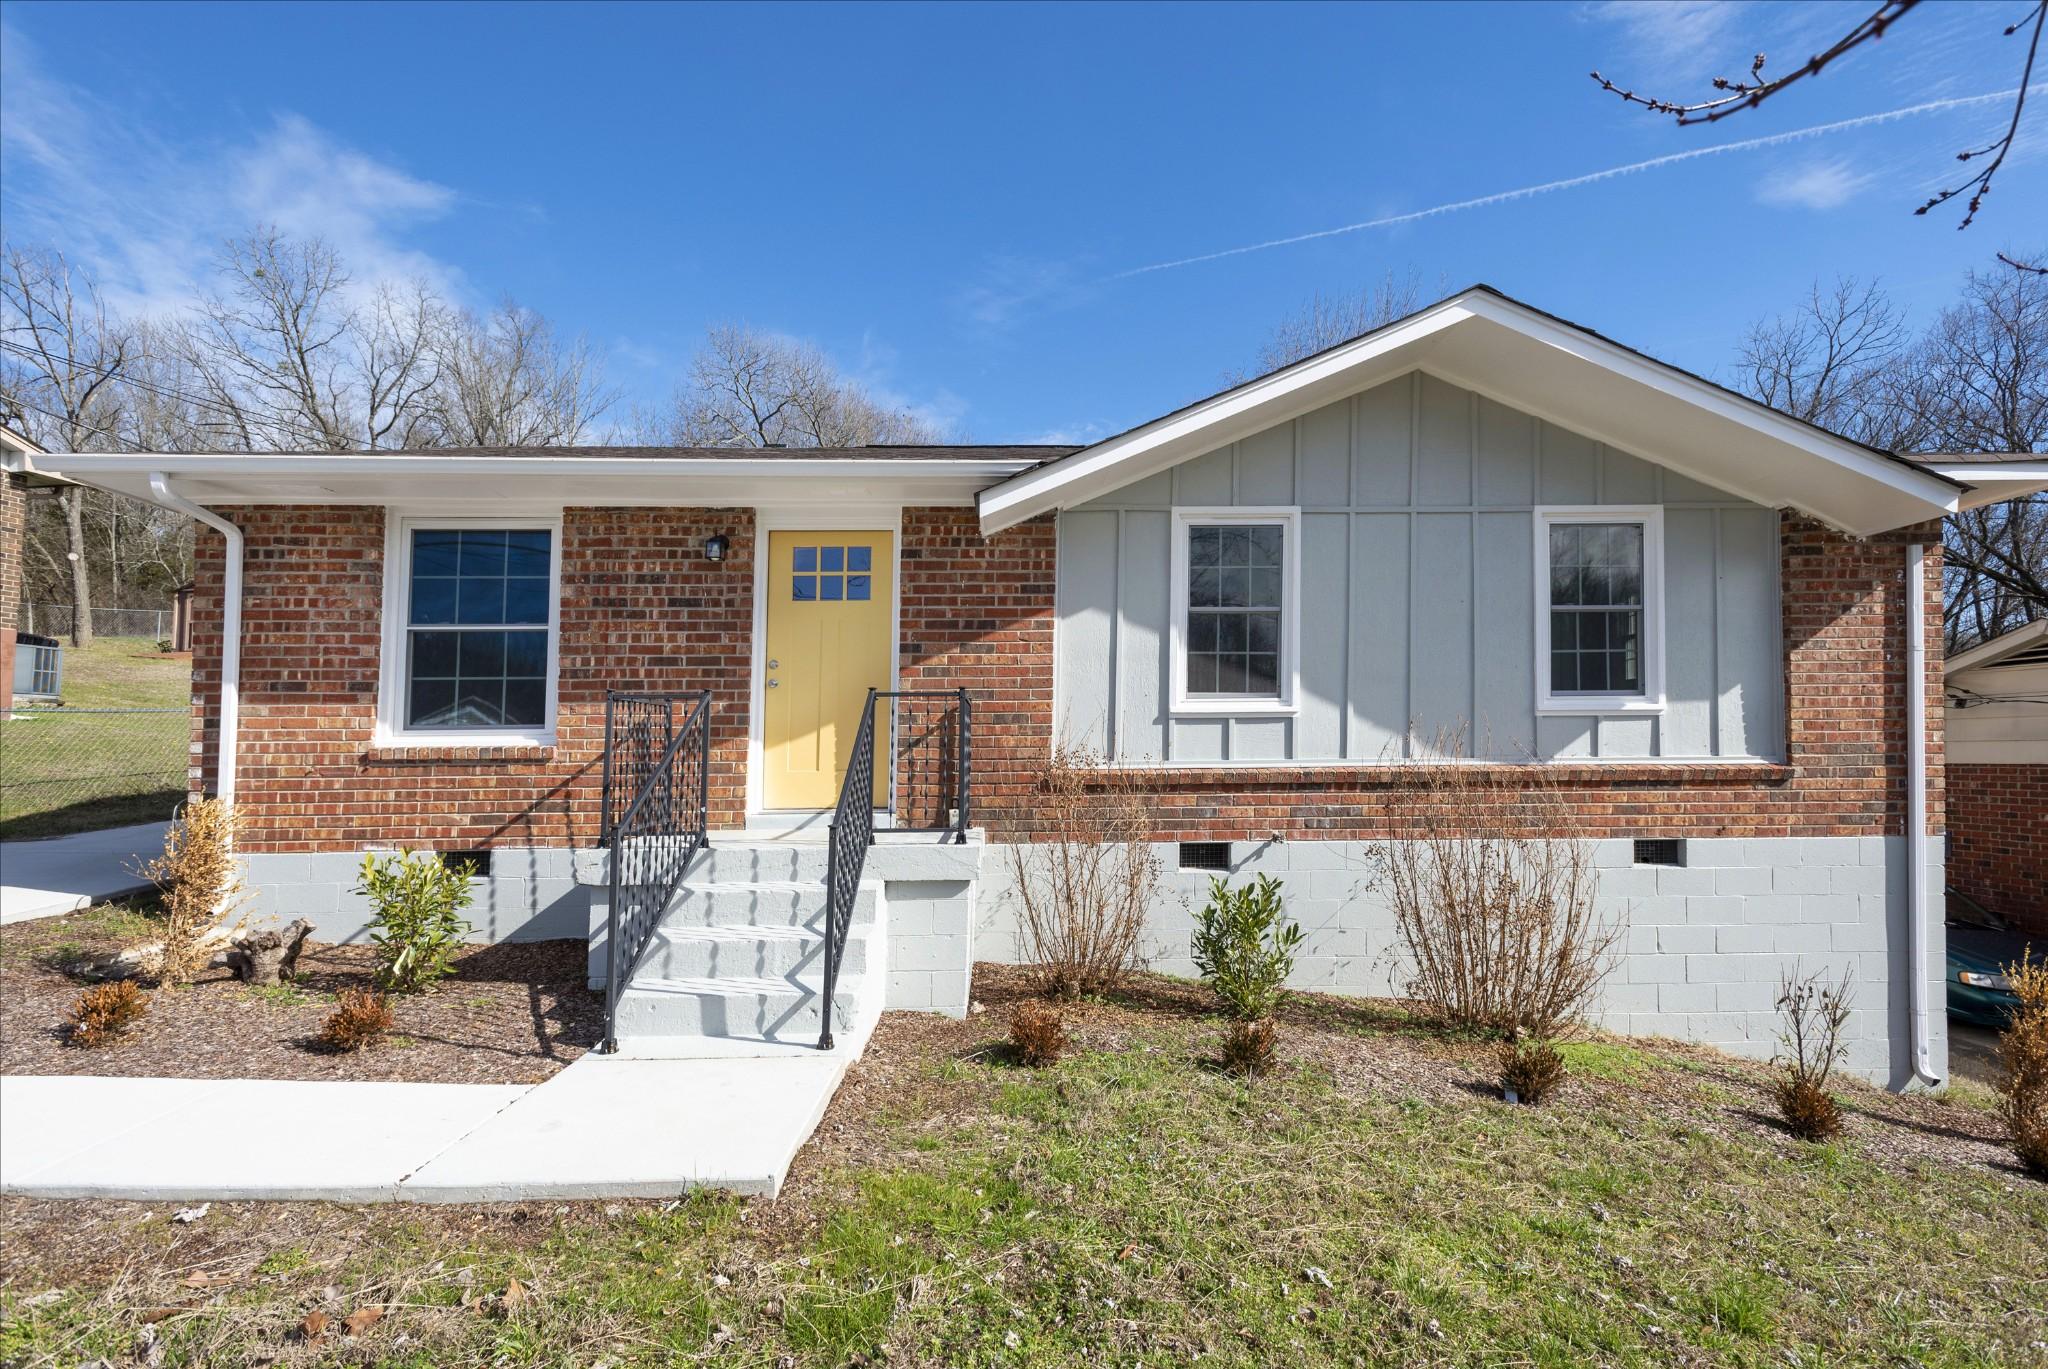 2437 Monticello Dr, Nashville, TN 37207 - Nashville, TN real estate listing